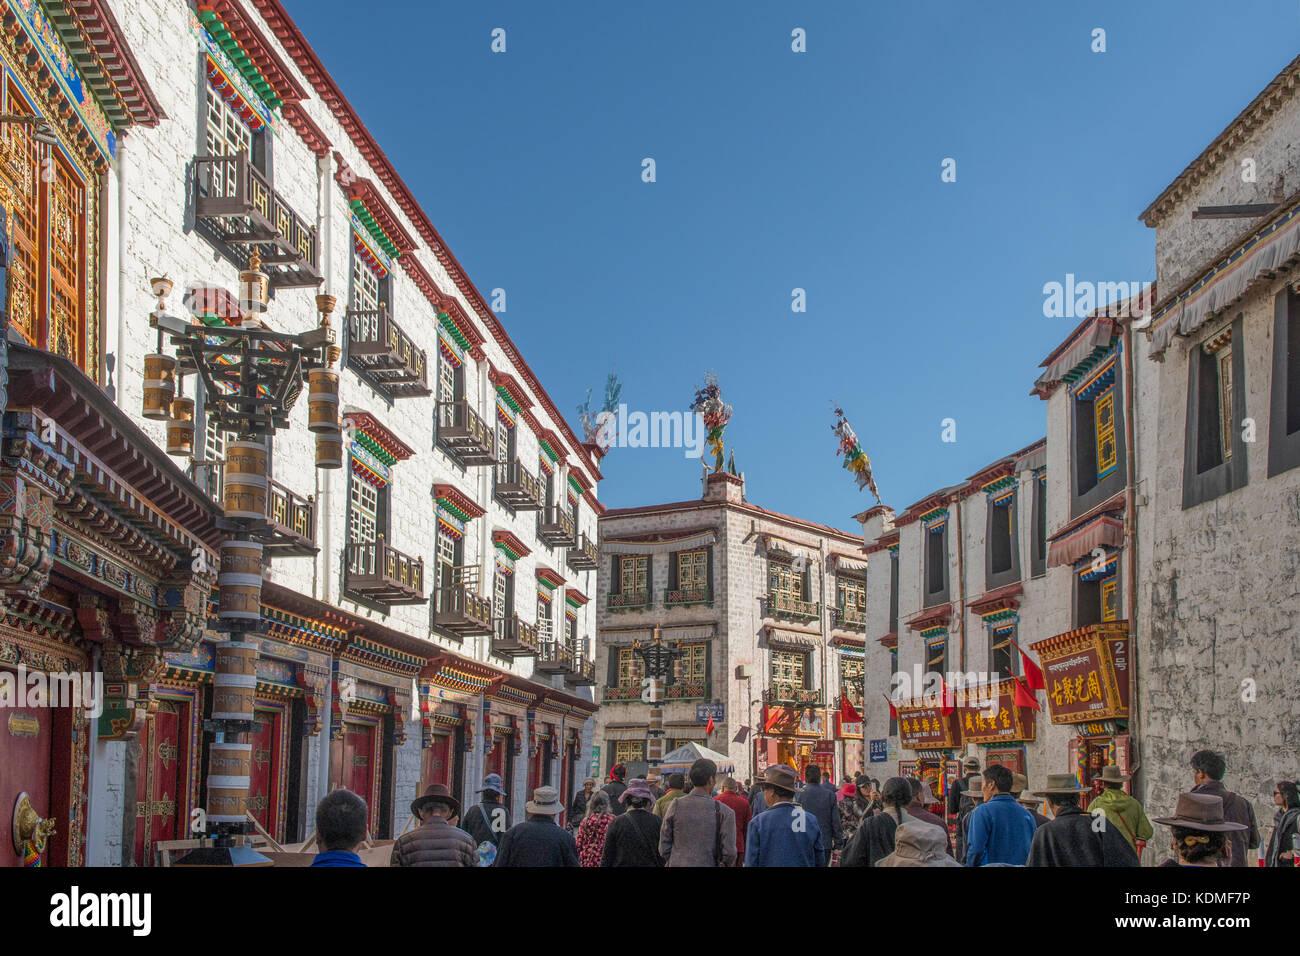 Barkhor Street, Lhasa, Tibet, China - Stock Image